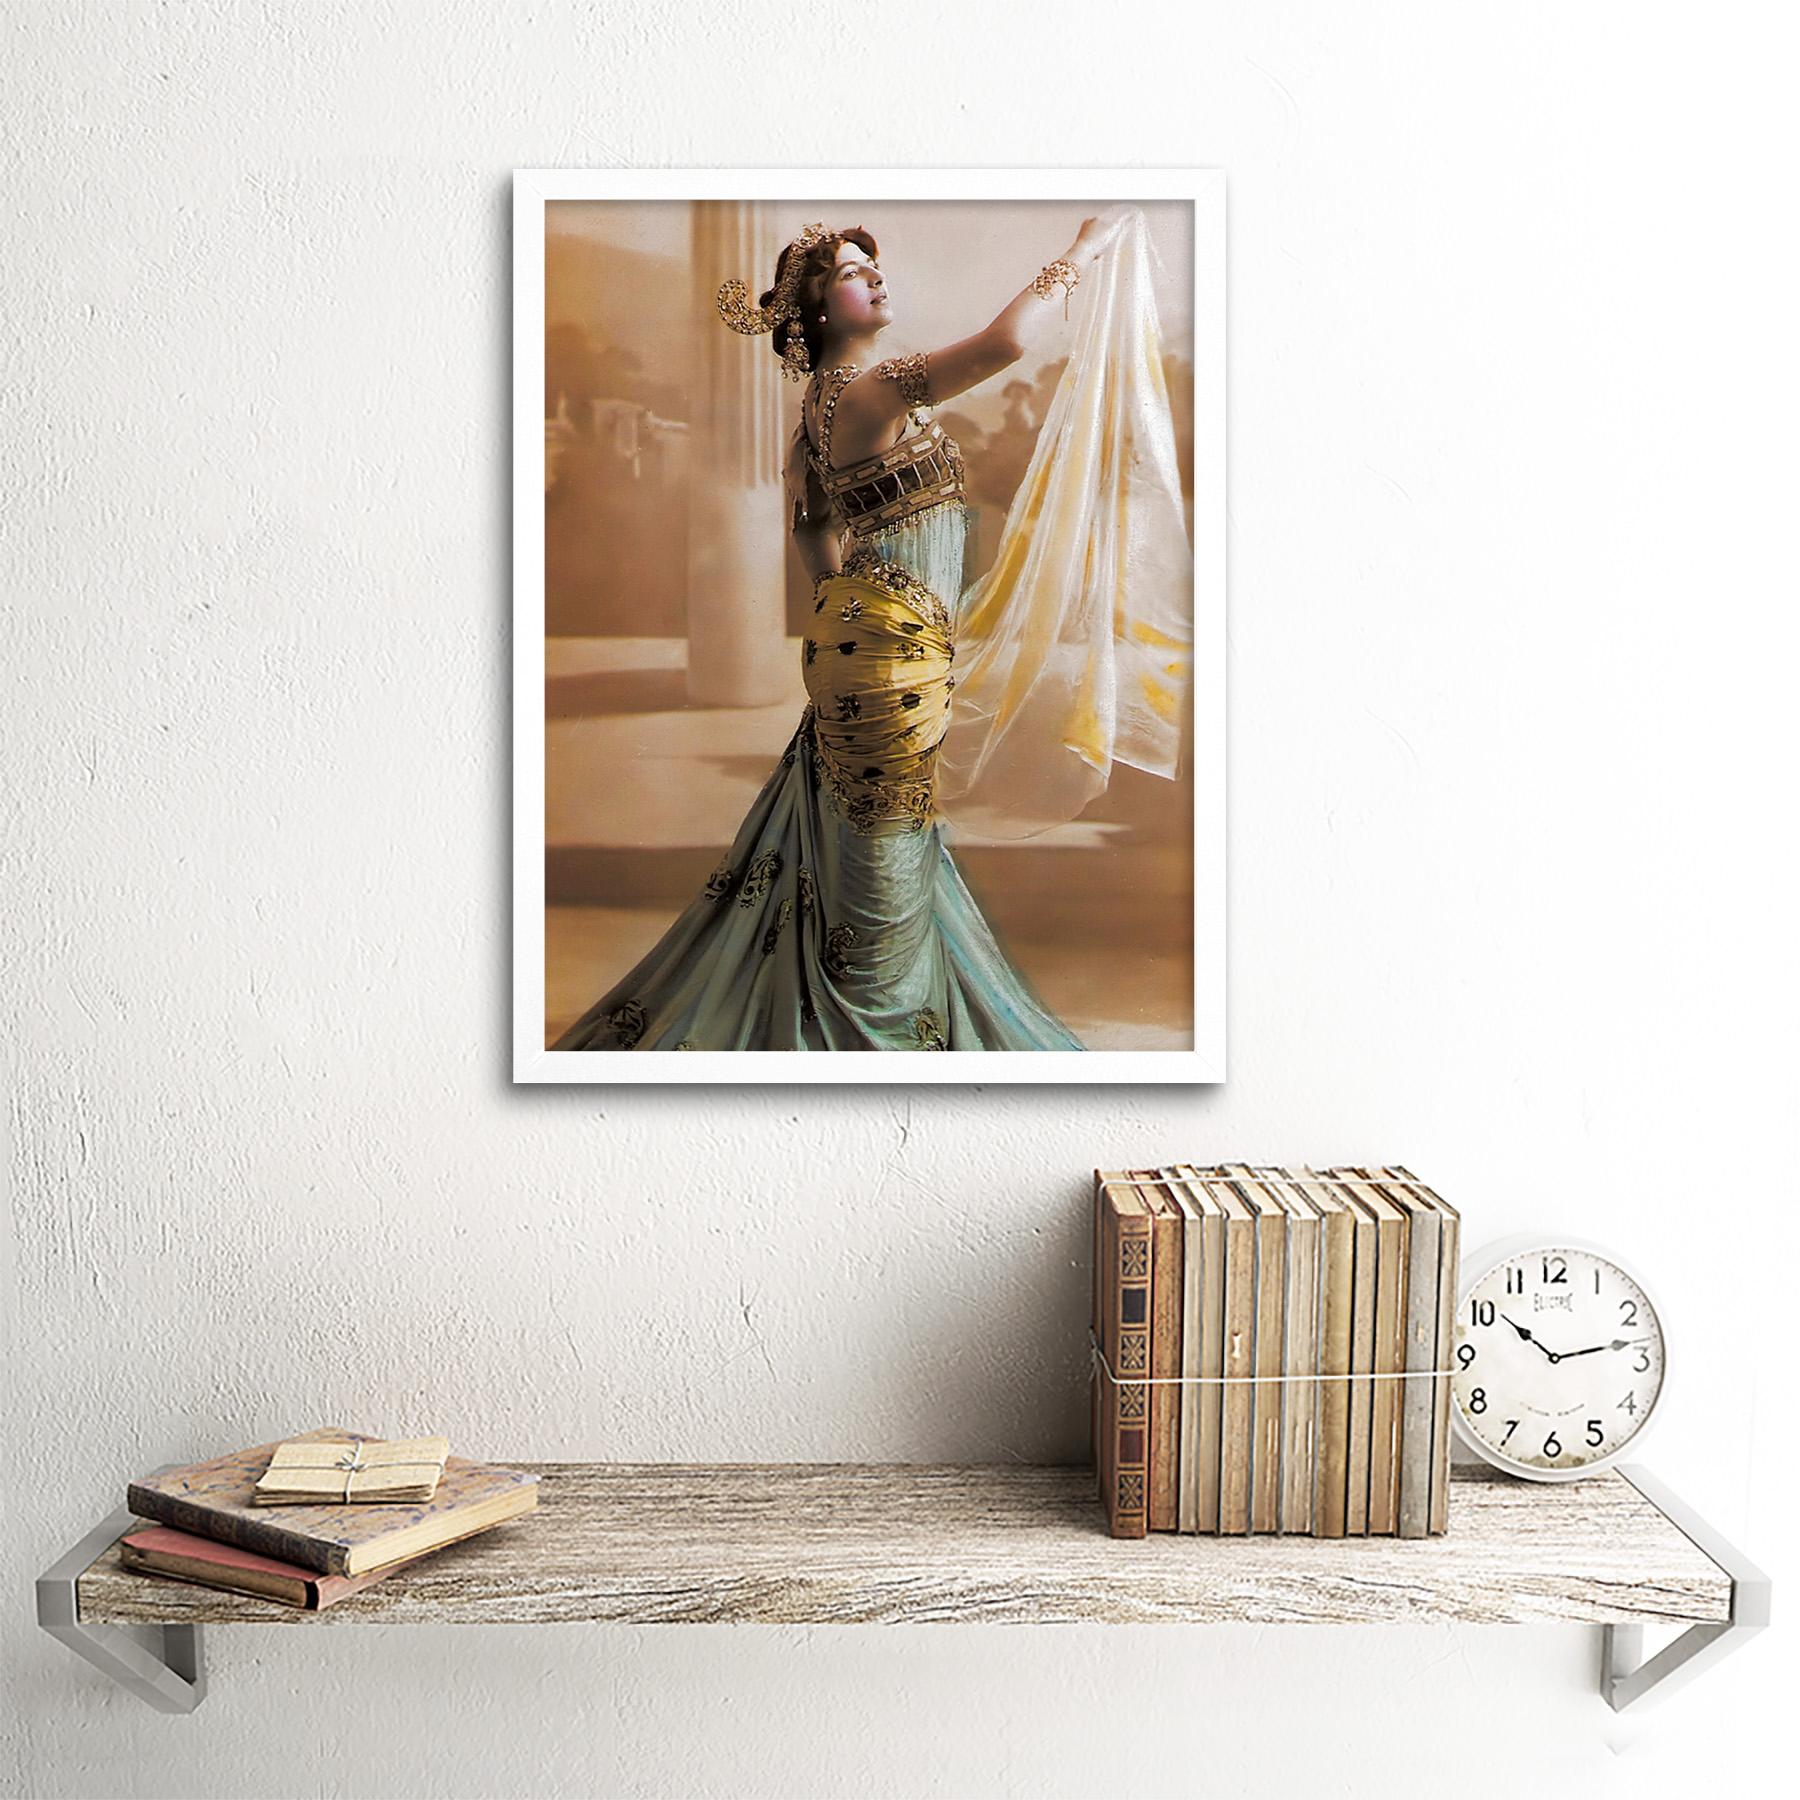 Hand-Coloured-Portrait-Dancer-Spy-Mata-Hari-Photo-Framed-Wall-Art-Poster thumbnail 18